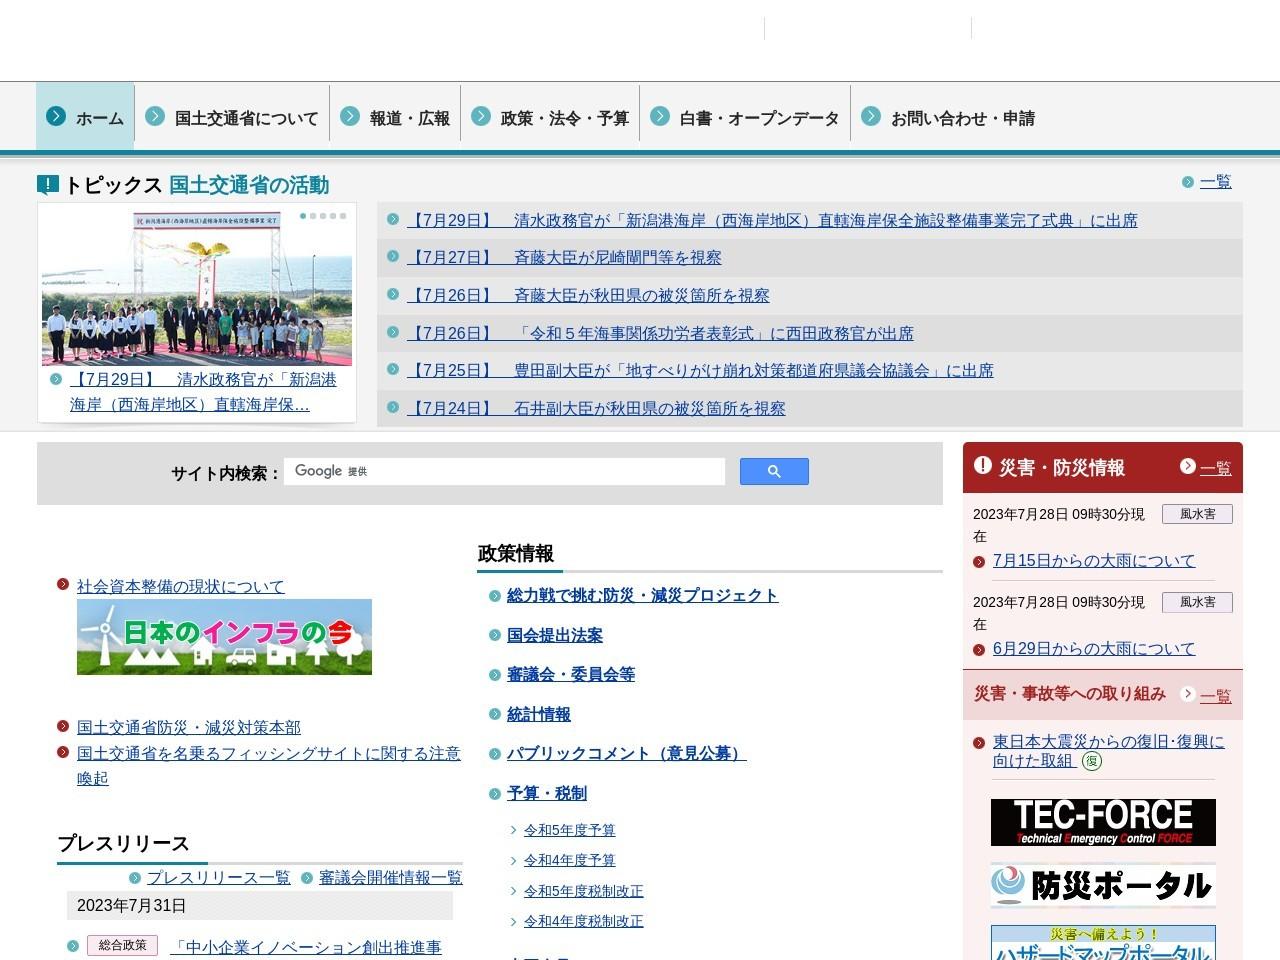 http://www.mlit.go.jp/road/station/road-station.html